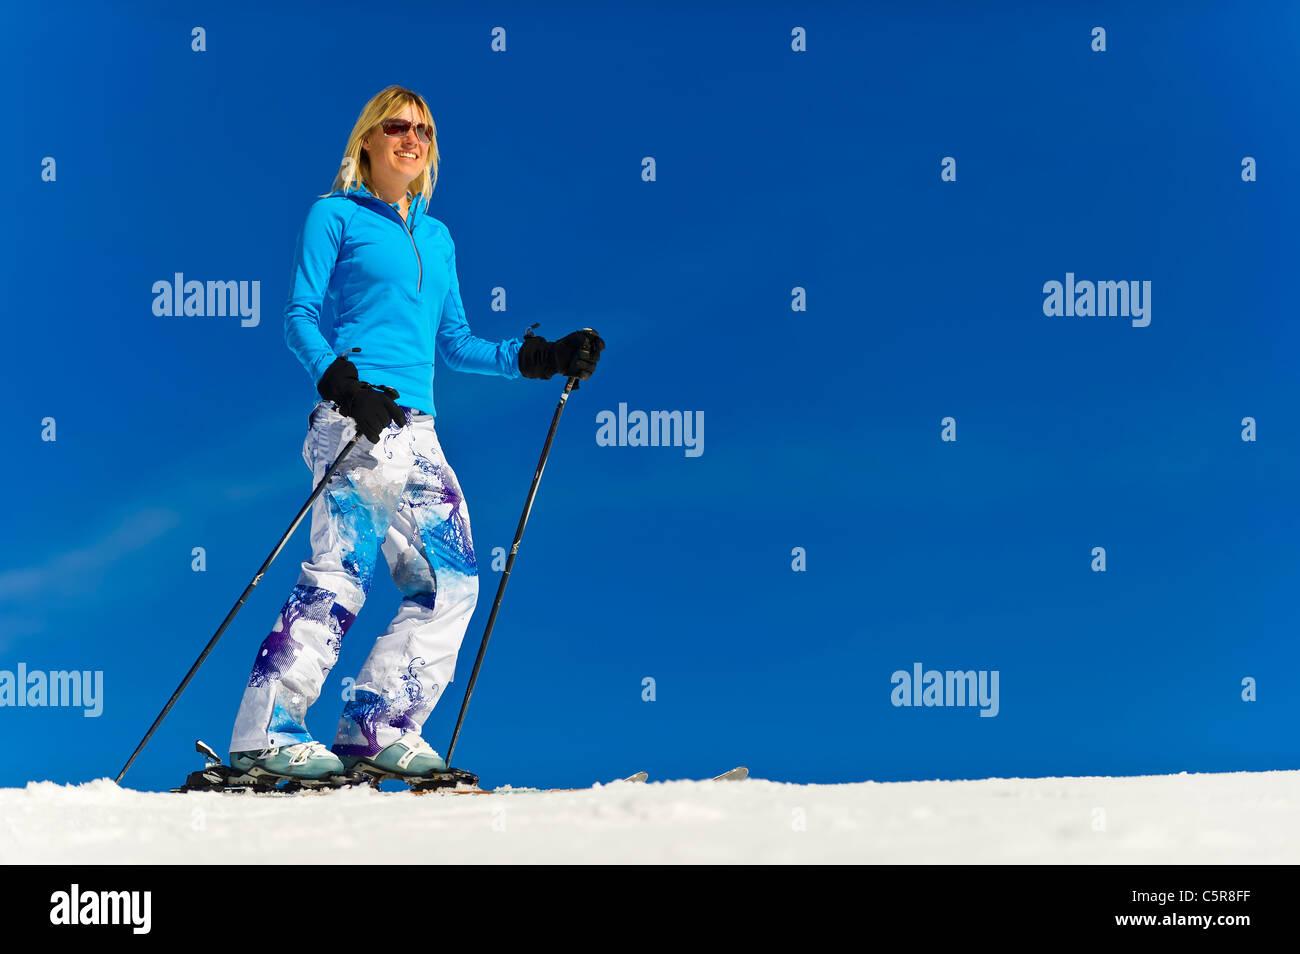 A woman enjoying her skiing holiday. - Stock Image